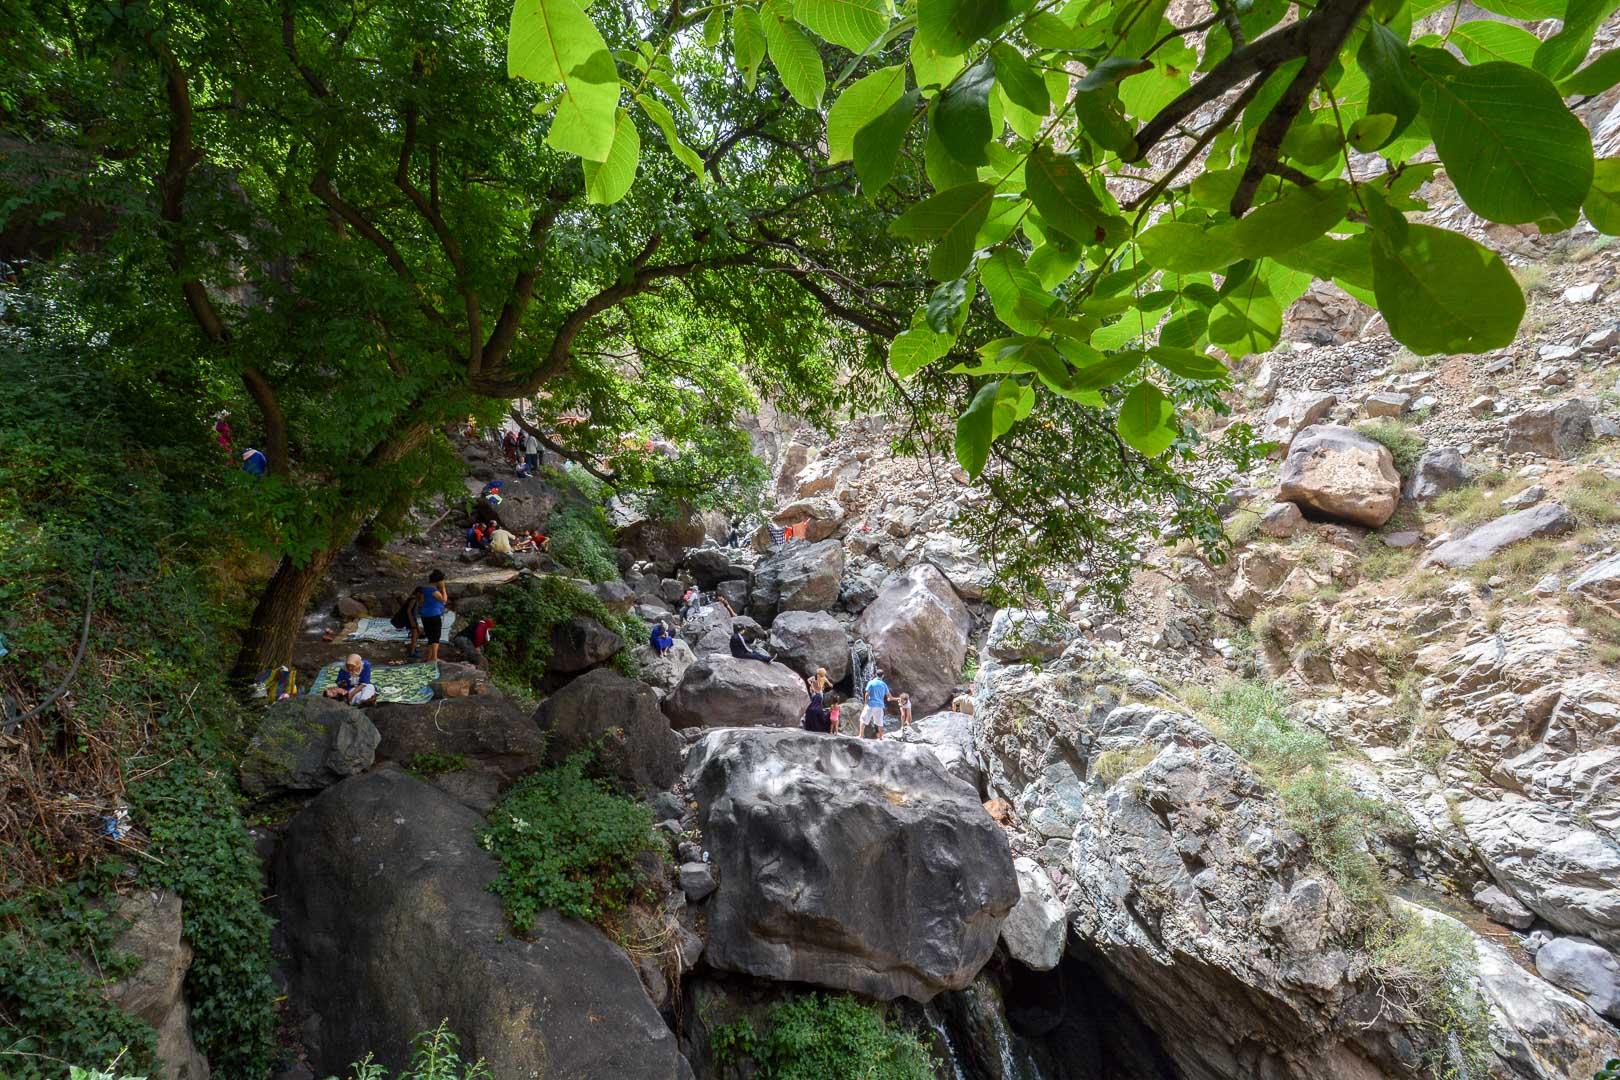 Picnics along the trail